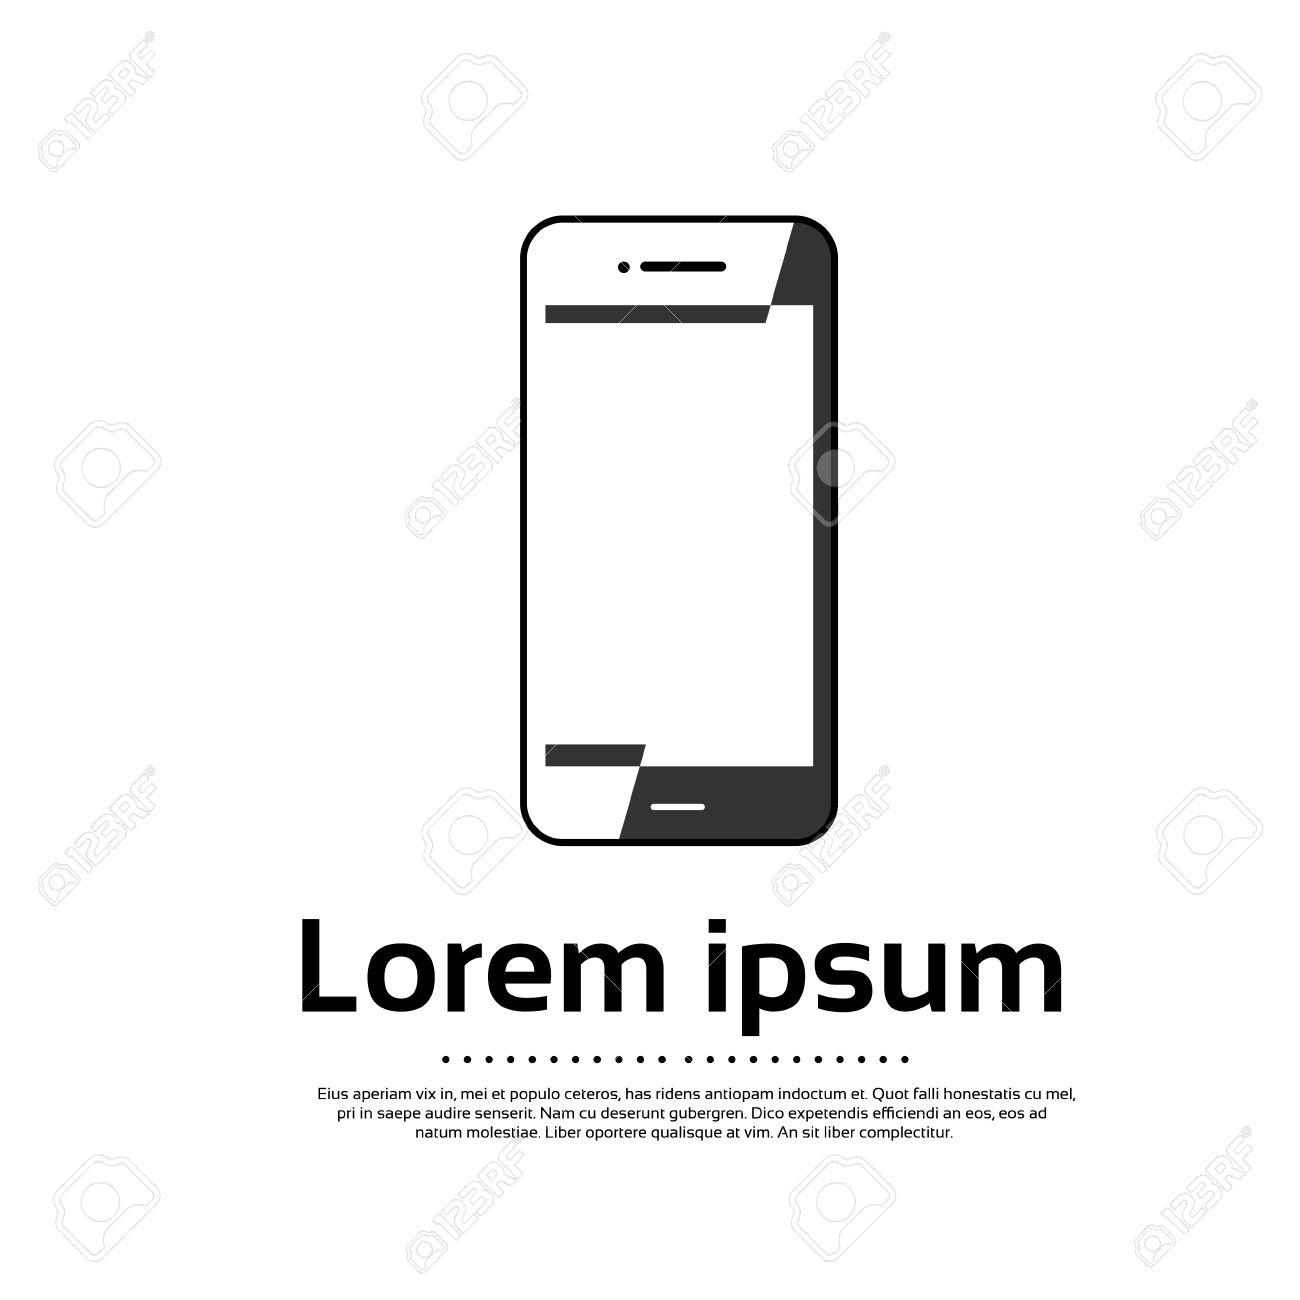 Generic Smartphone Logo Design - Free Clip Art